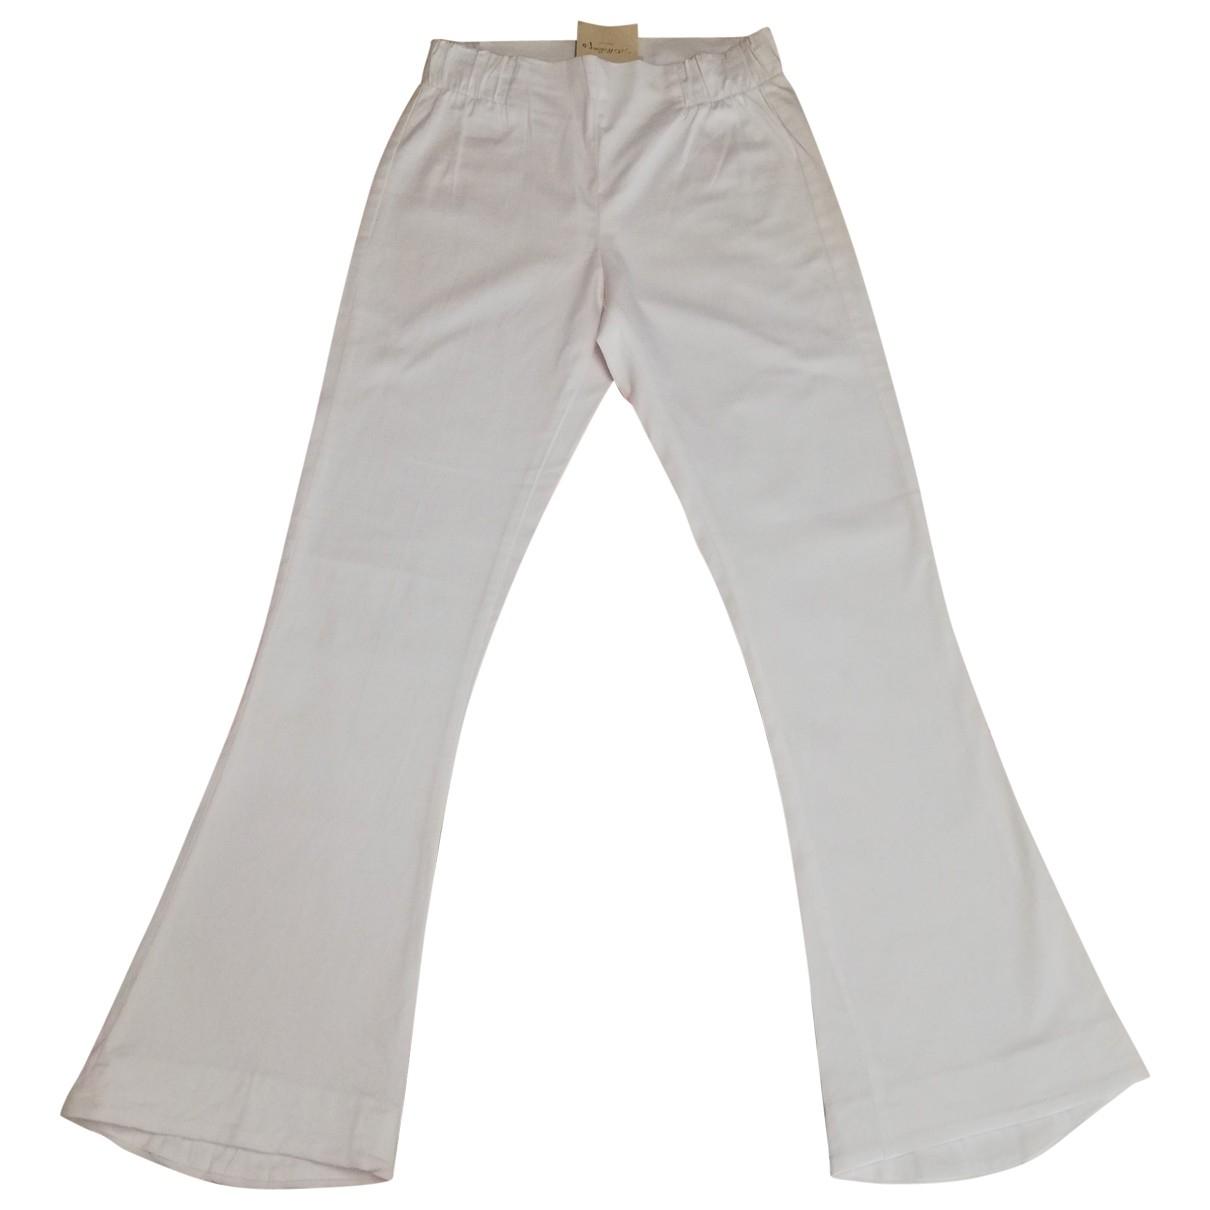 Pantalon en Algodon Blanco Non Signe / Unsigned